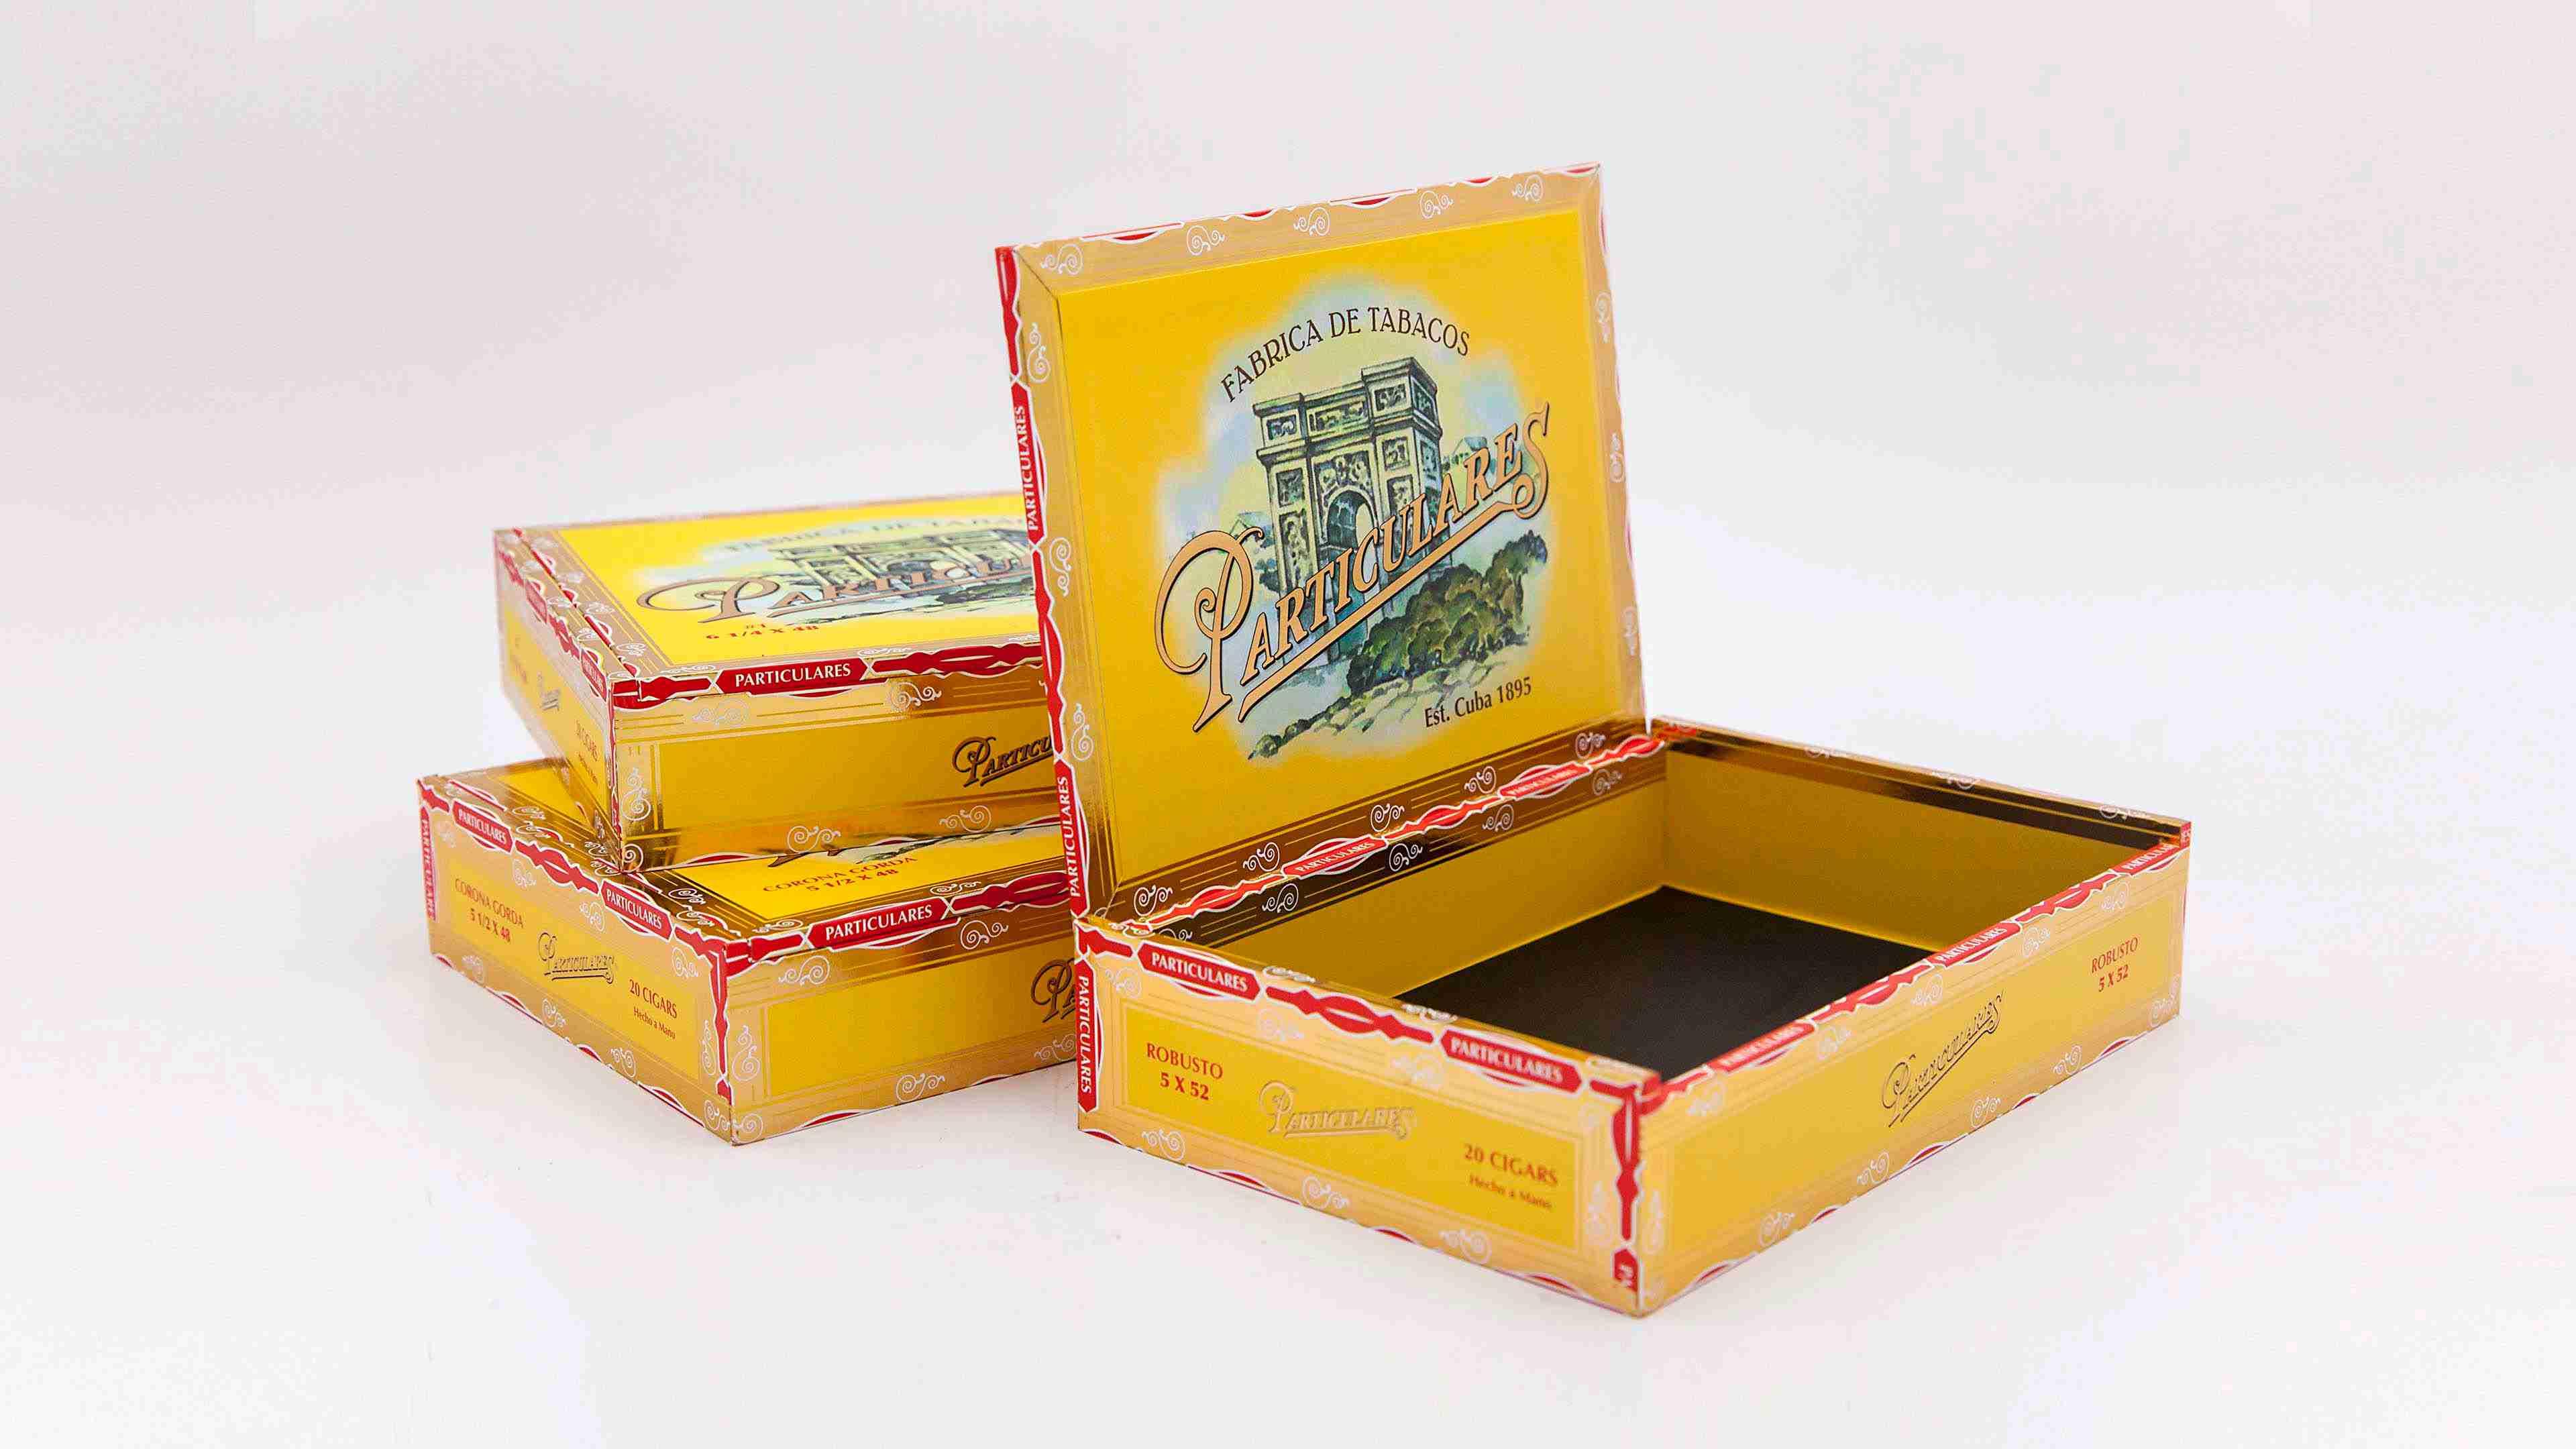 Particulares Cigar Boxes